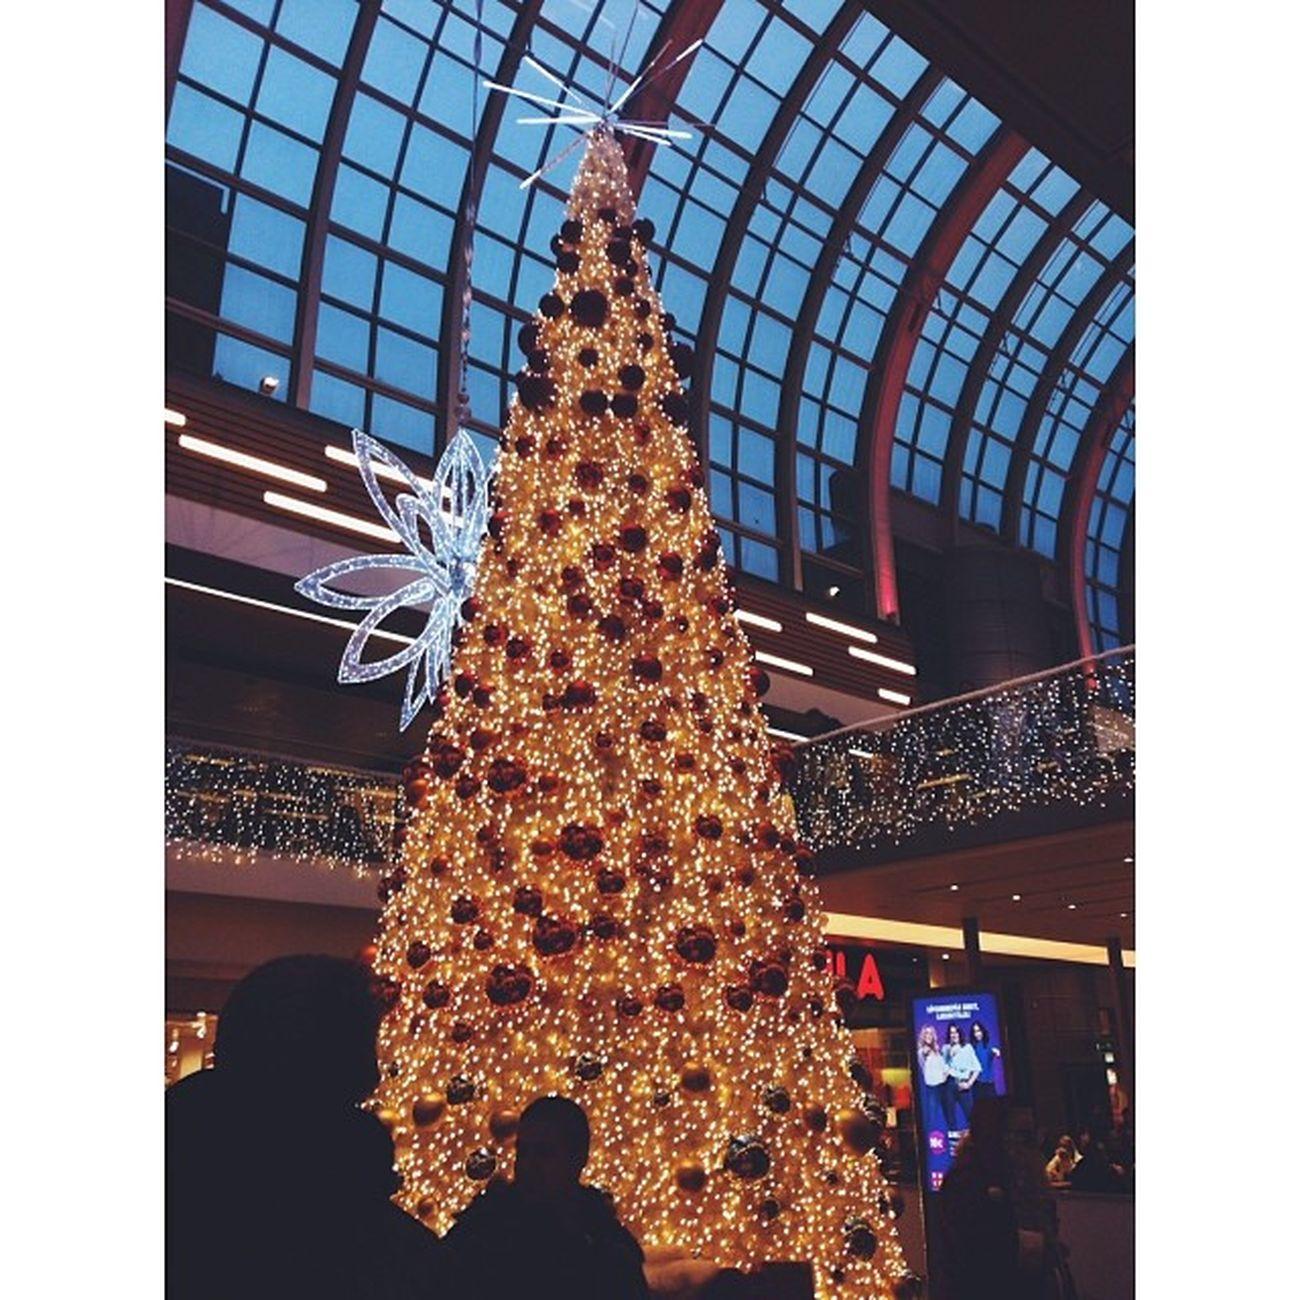 Christmastree Itis  Helsinki Finland shoppingcenter beautiful christmas